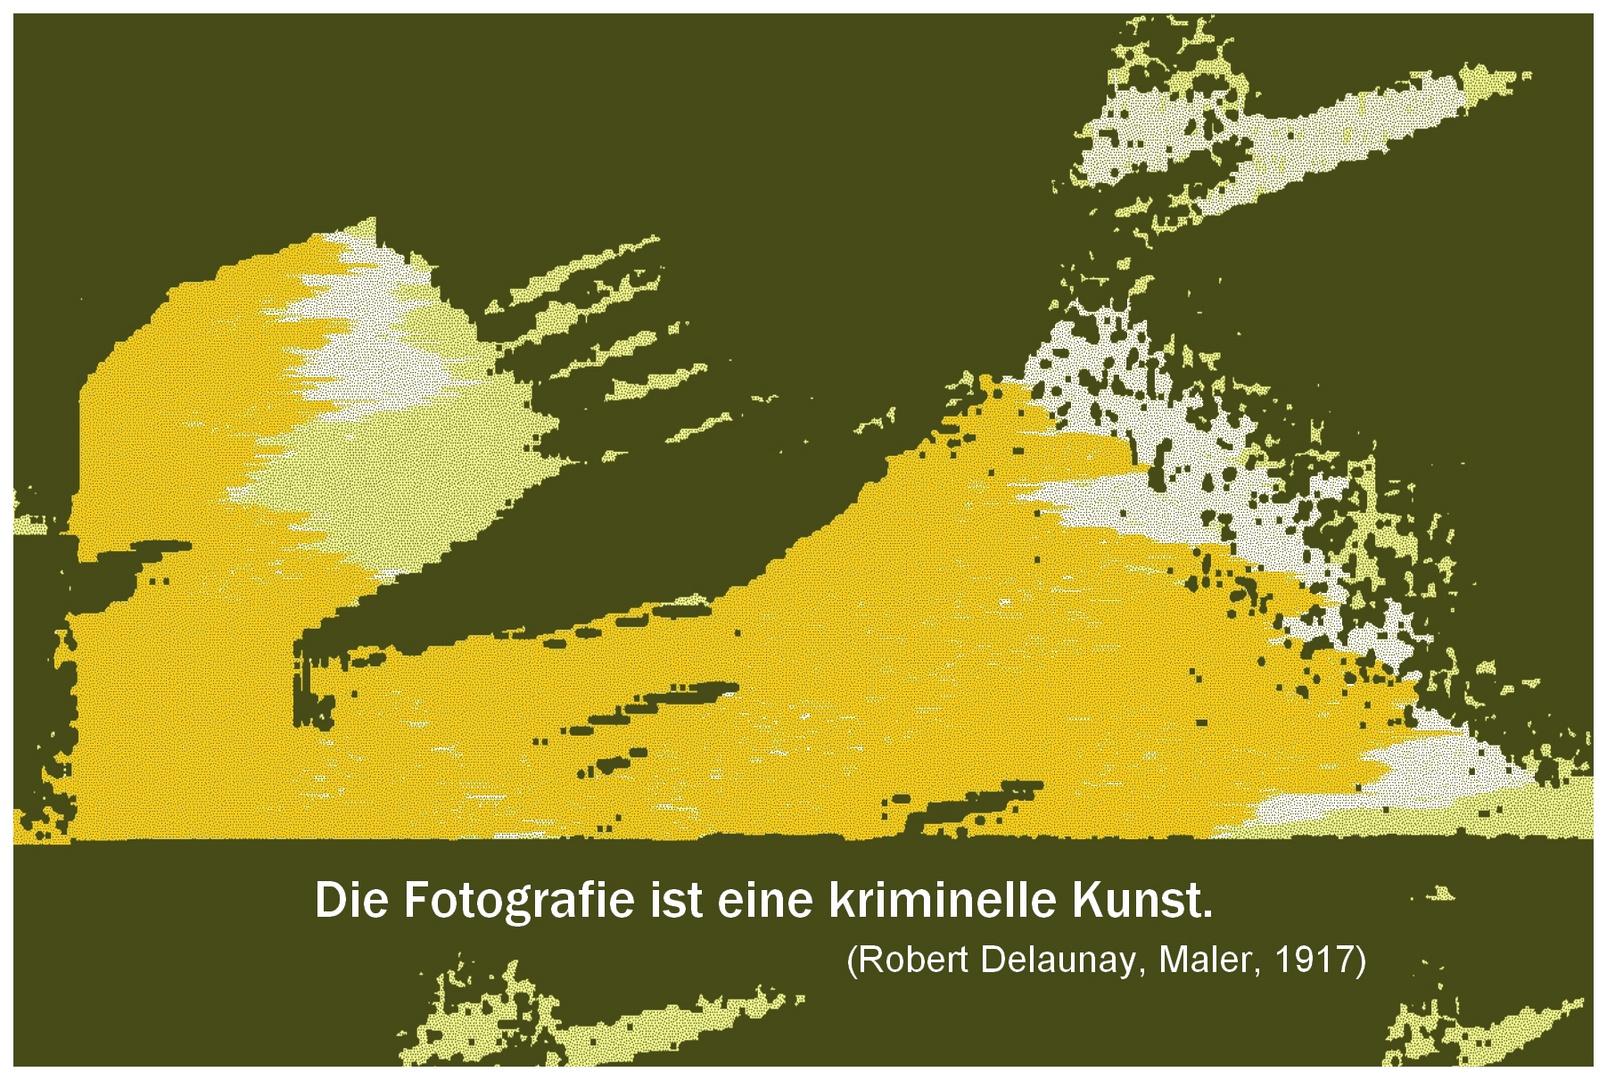 Fotografie Ist Eine Kriminelle Kunst Robert Delaunay Foto